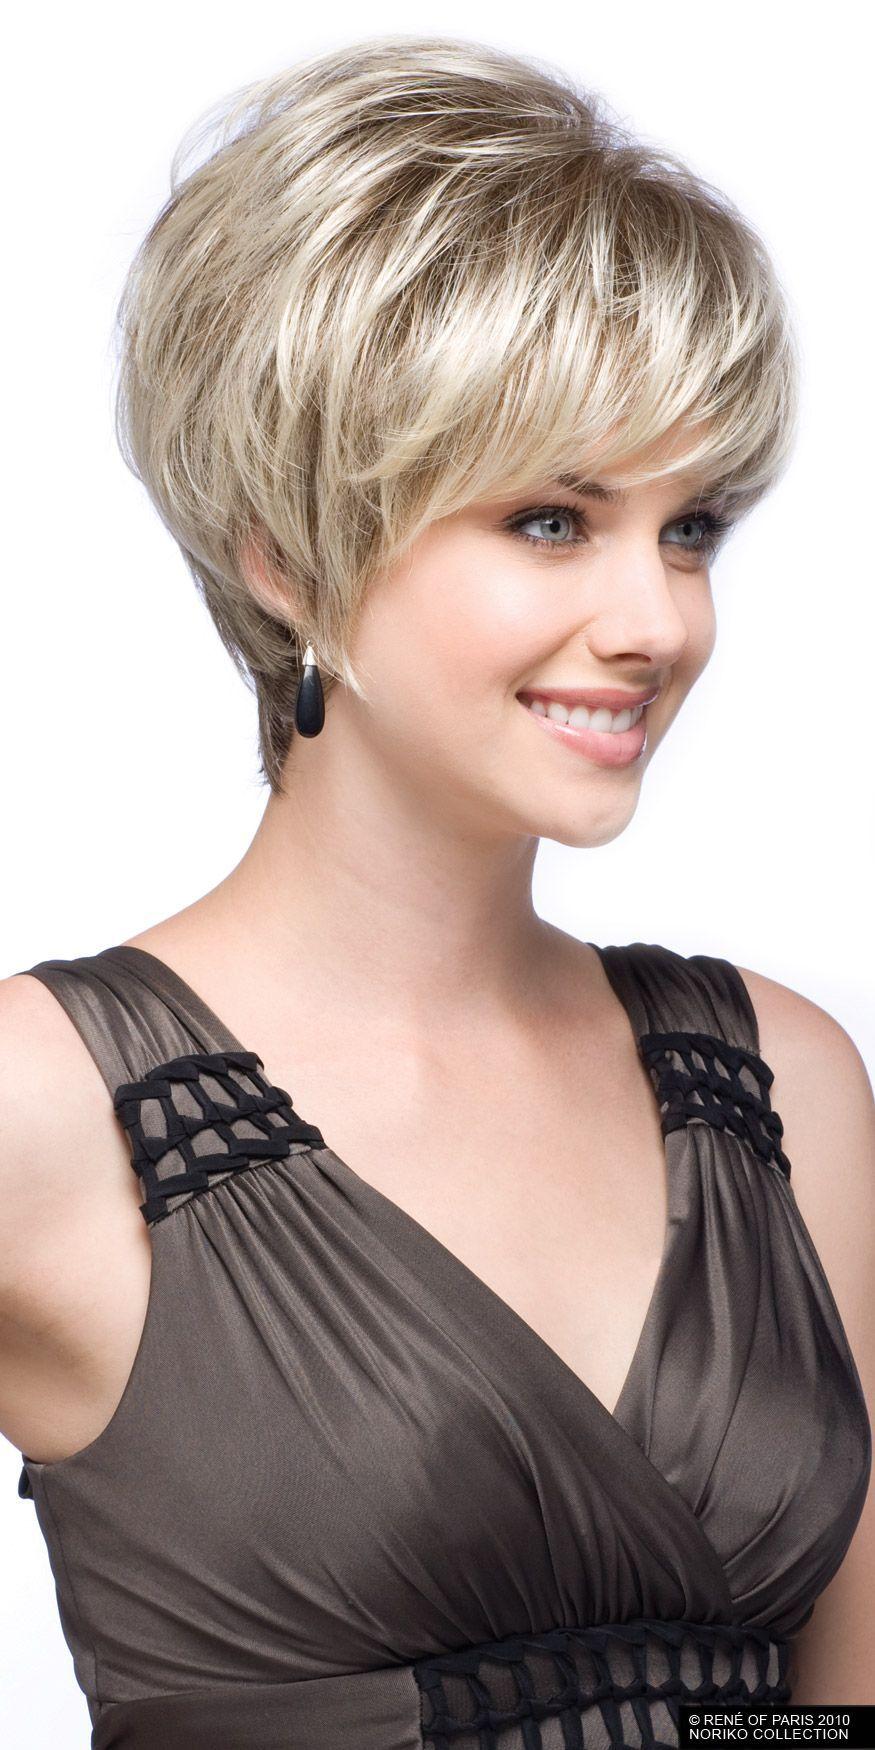 Pin by valerie on short hair pinterest easy hairstyles short